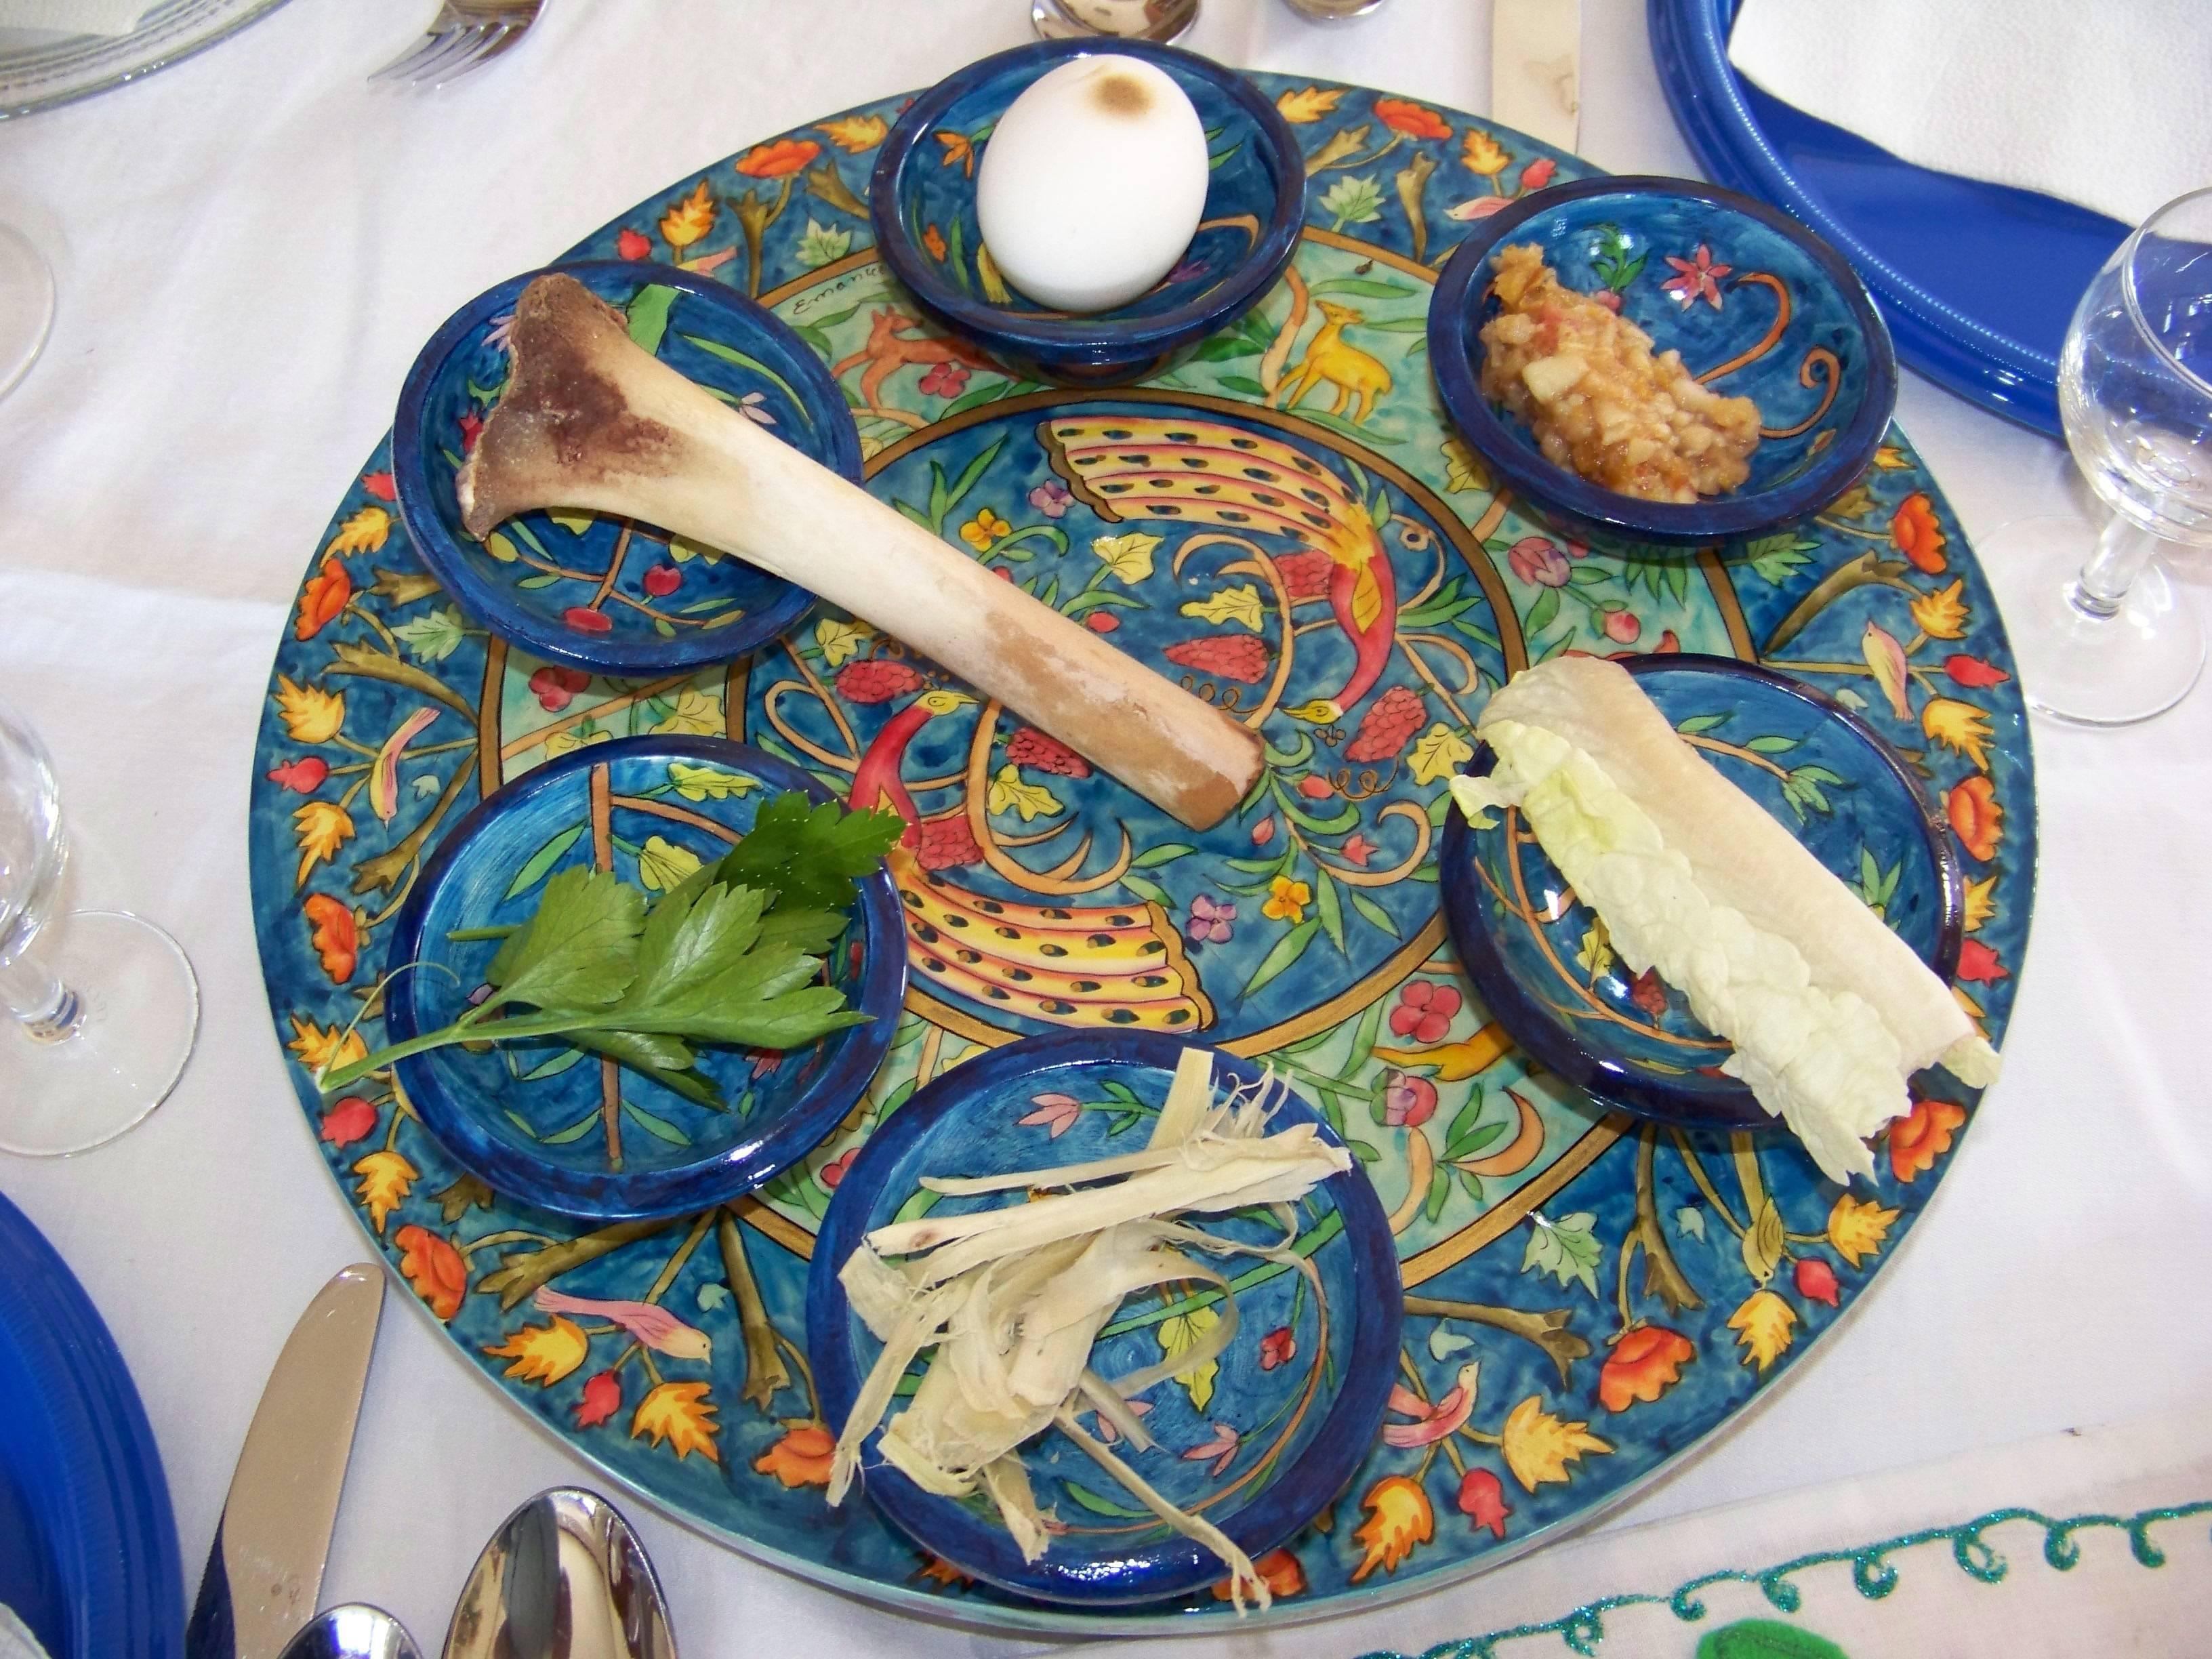 d58d133f0537b8ada8b8_Passover_Seder.jpg